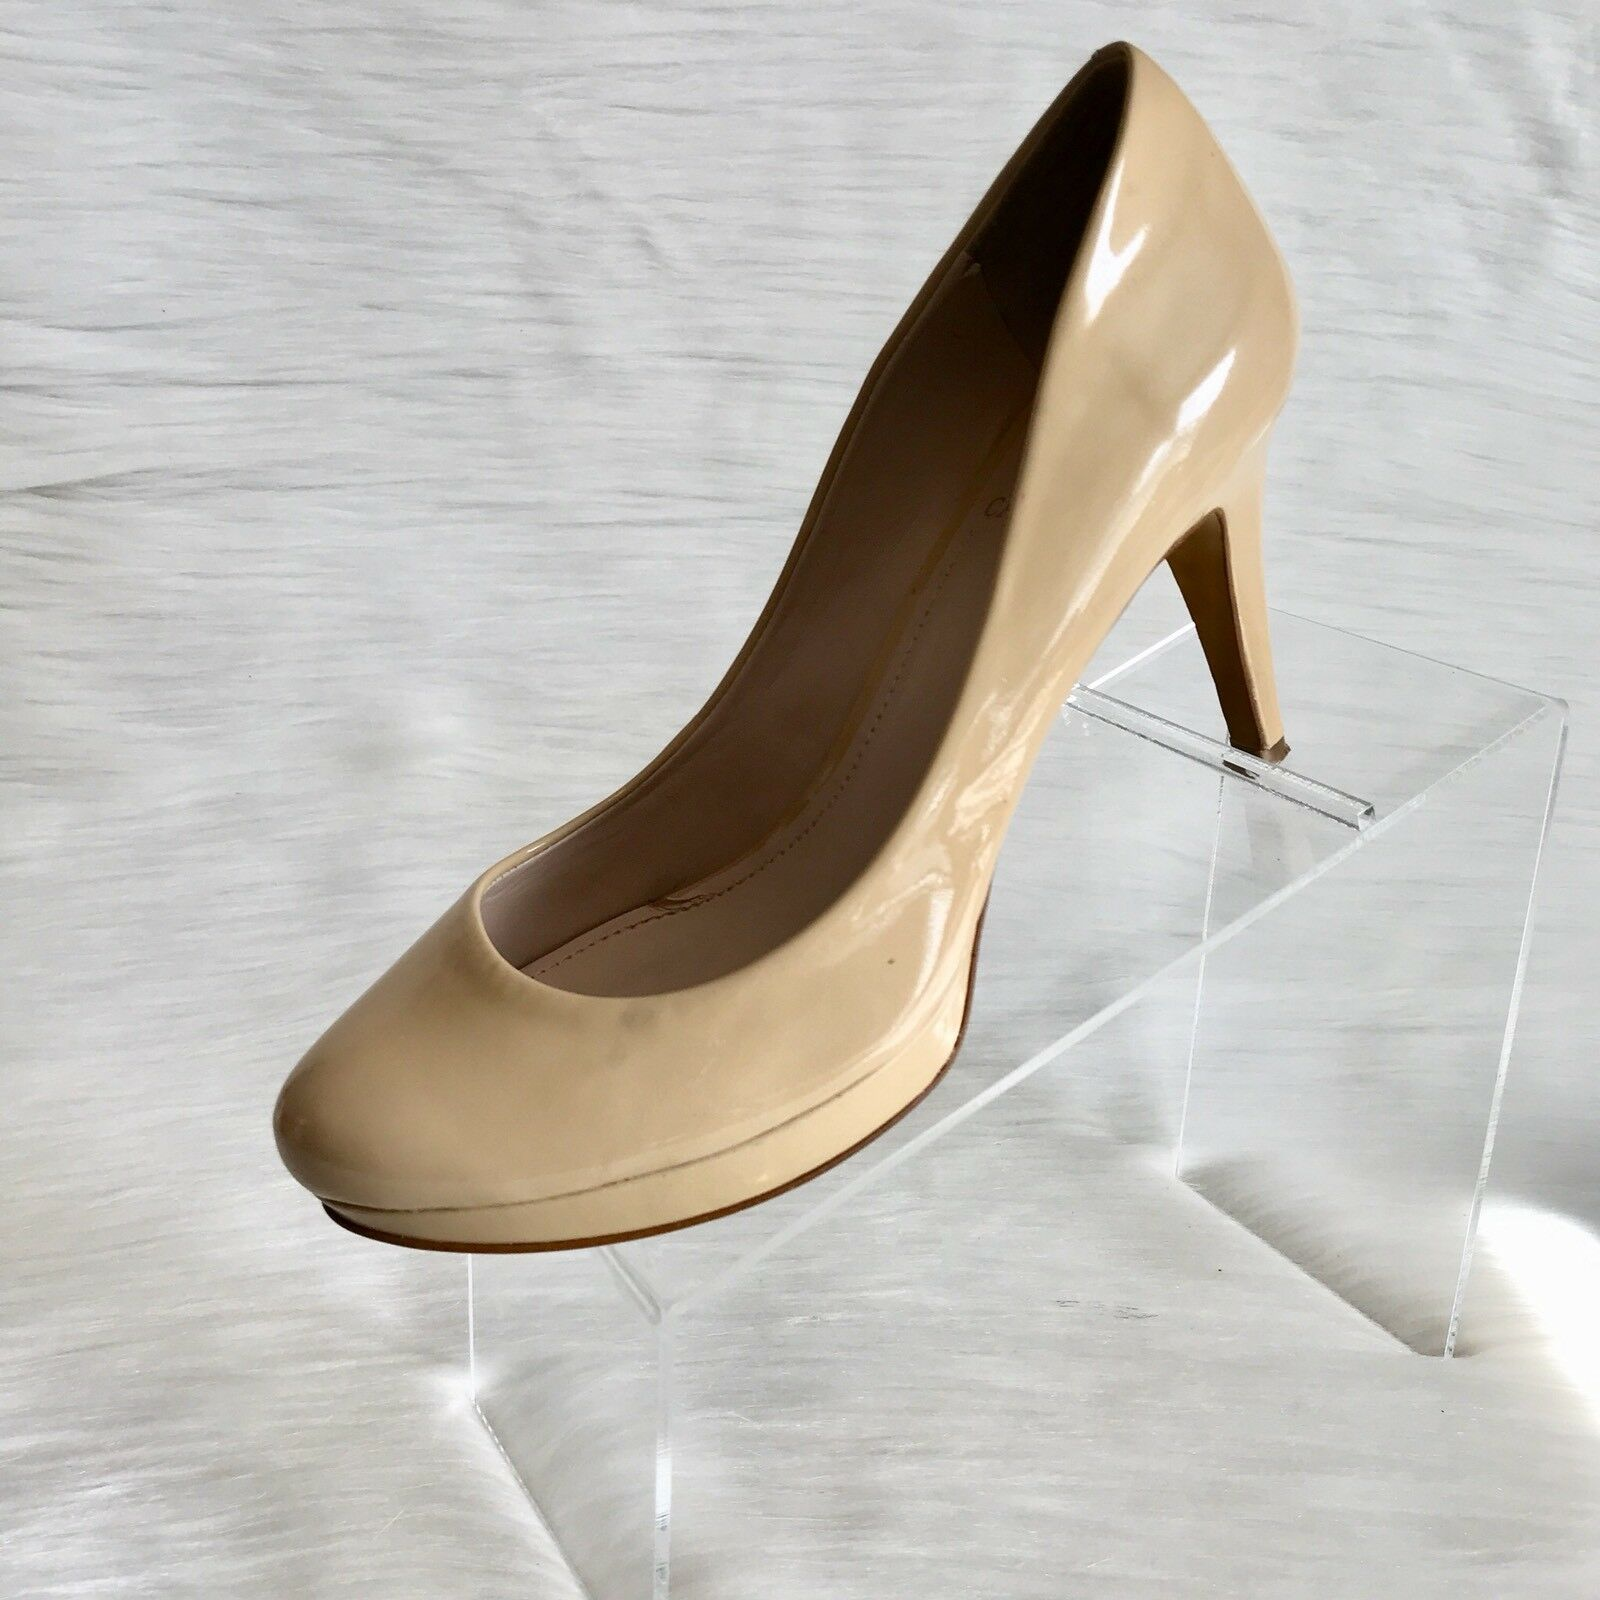 Vince Camuto women's Platform pumps Beige patent leather High Heel  Size 8.5 M